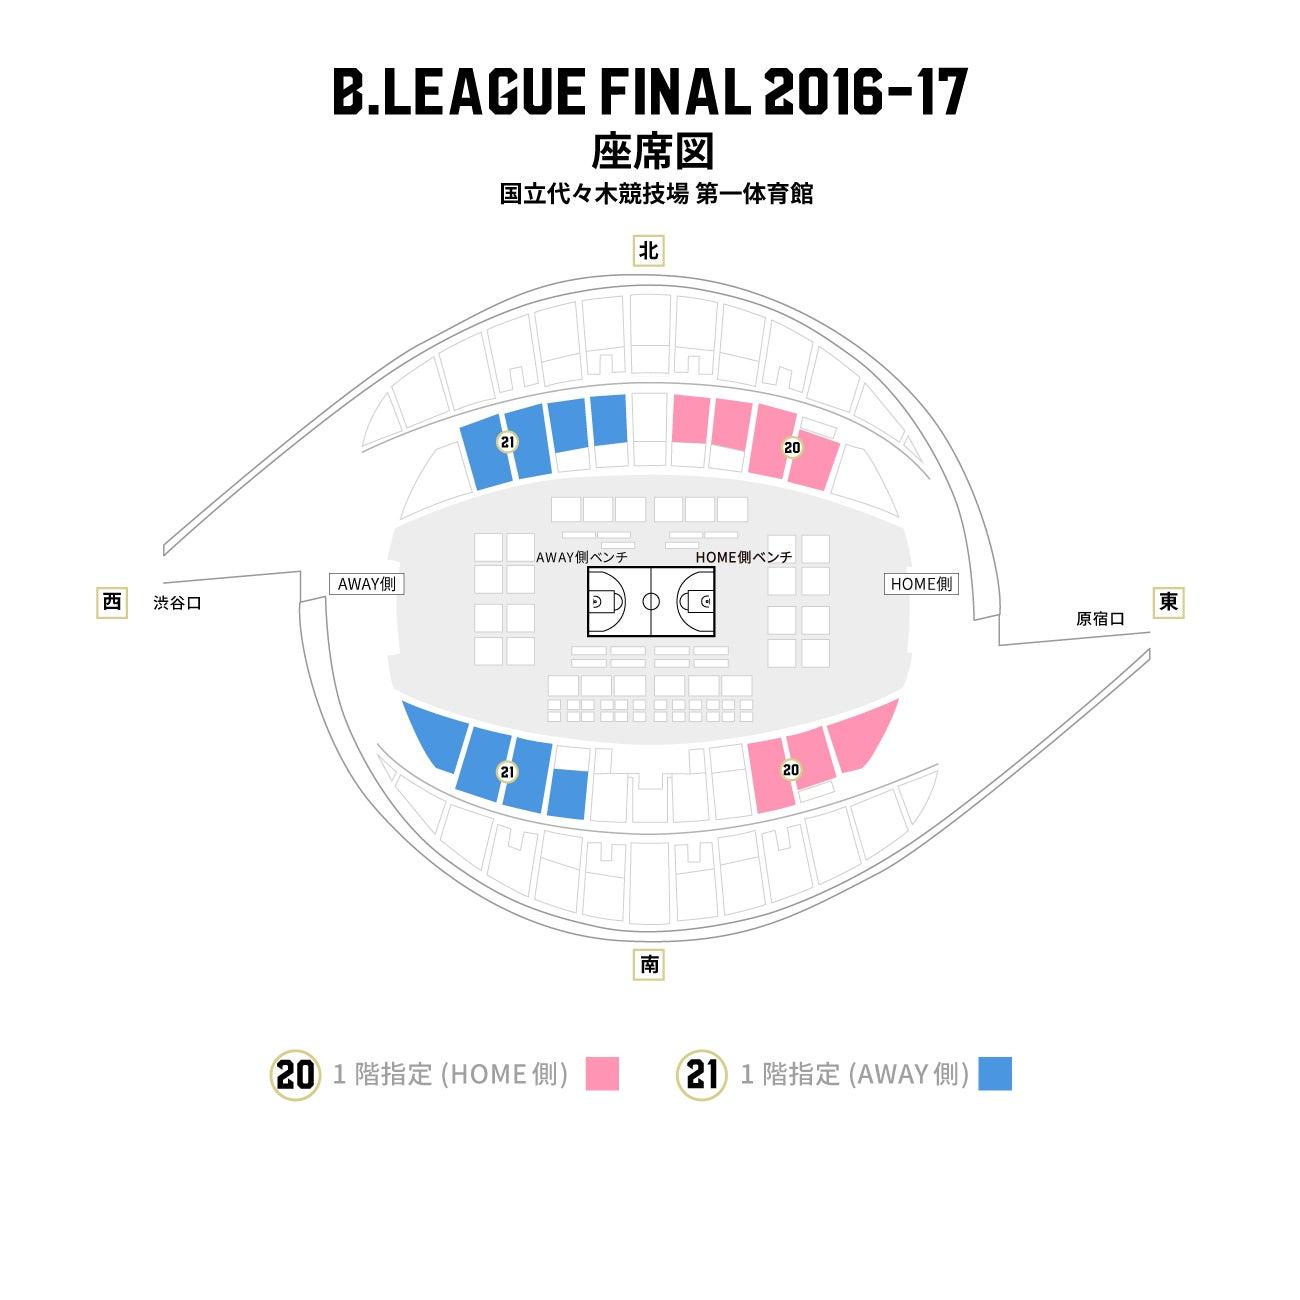 seatview_final_seat_20_21.jpg